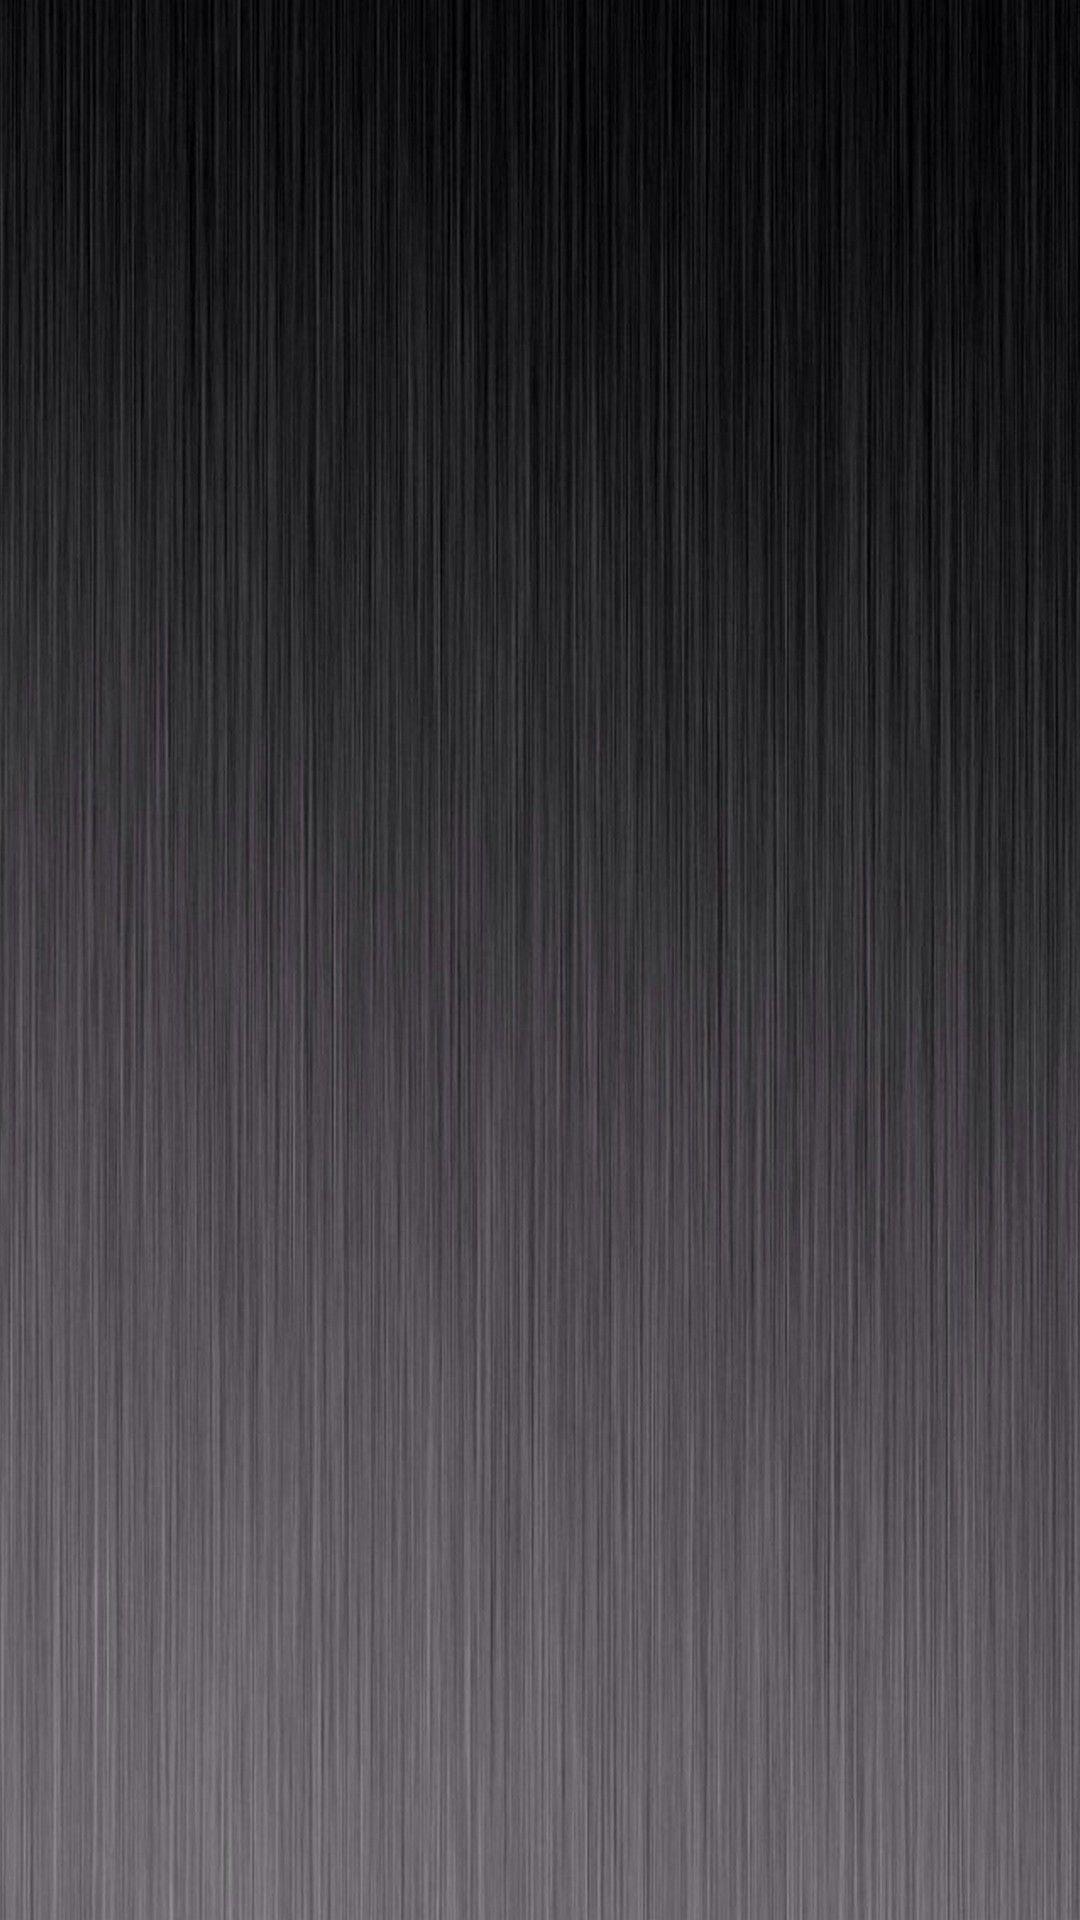 Wallpaper Grey Wallpaper Iphone, Best Iphone Wallpapers, Silver Wallpaper,